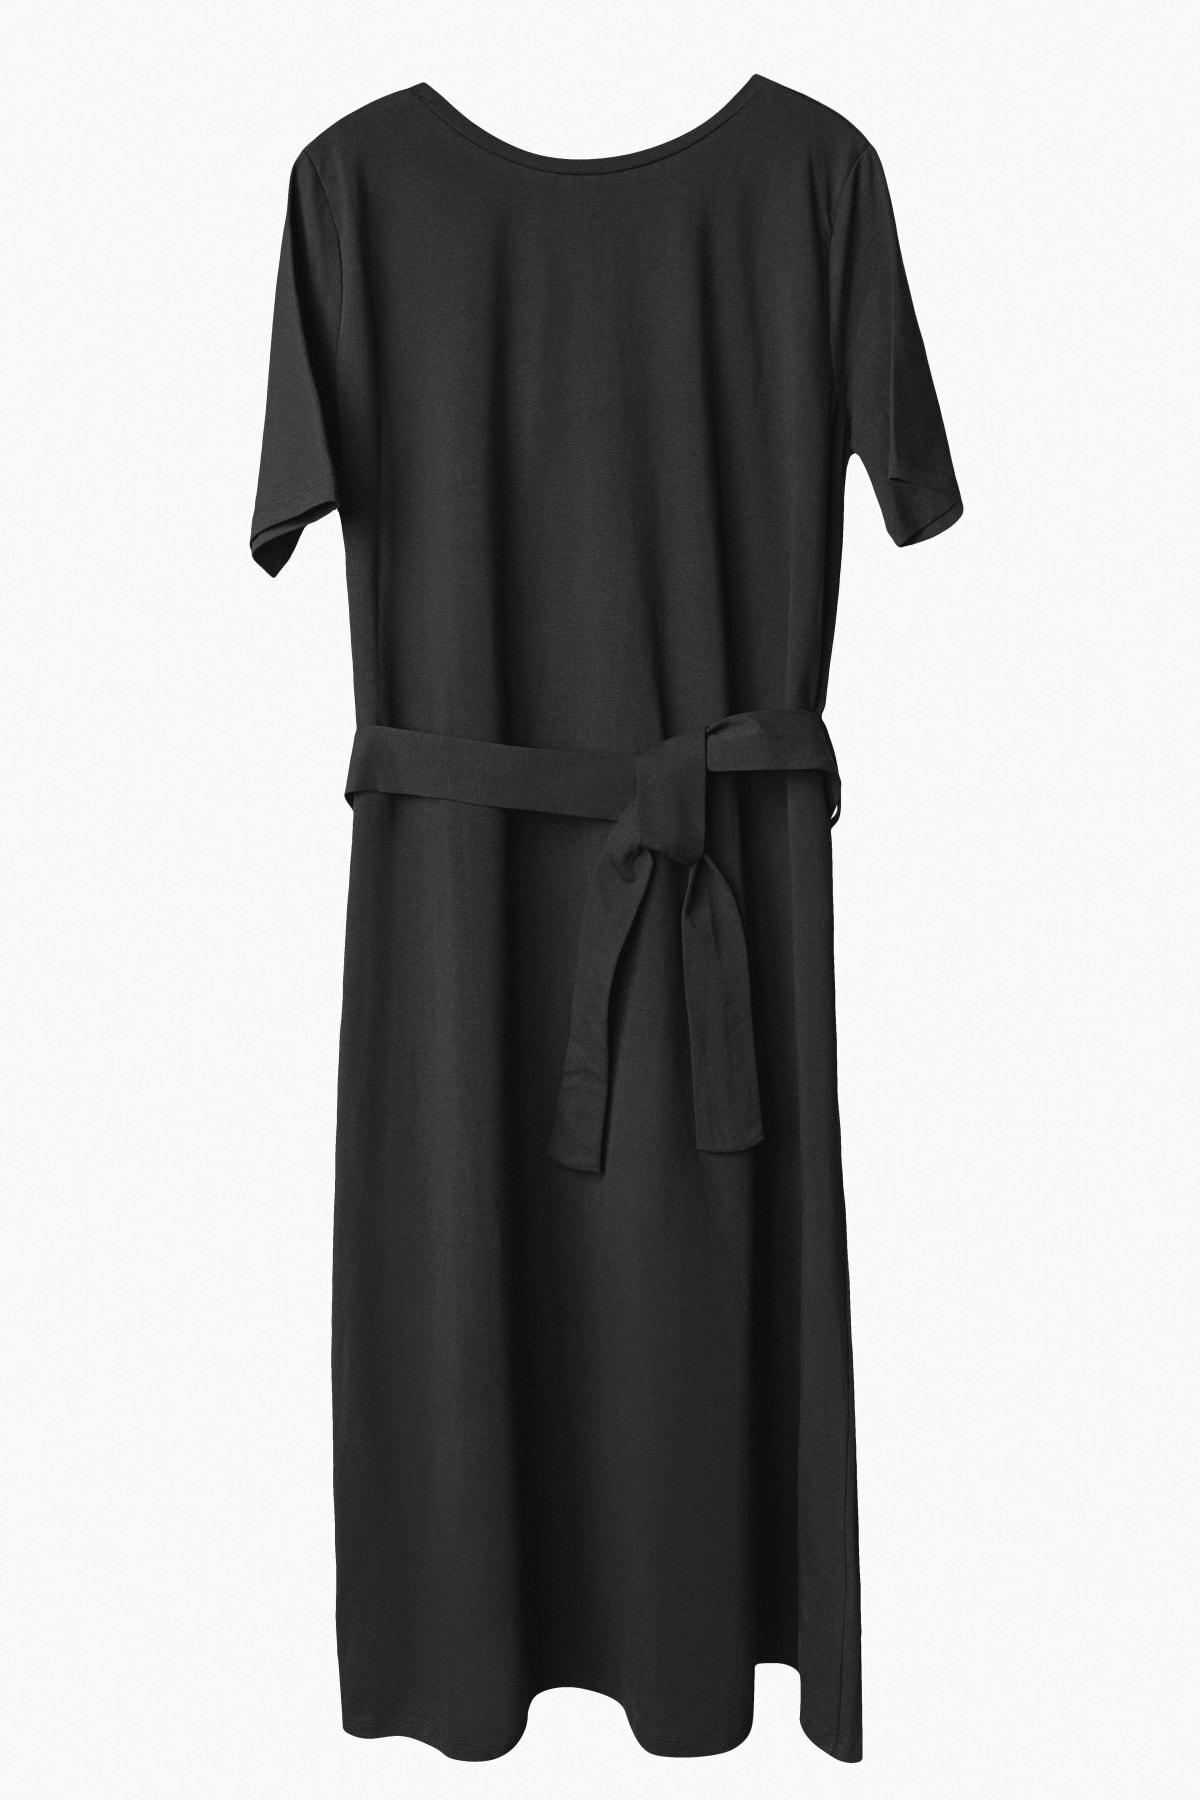 BeCasual Beli Kemerli Penye Elbise 1